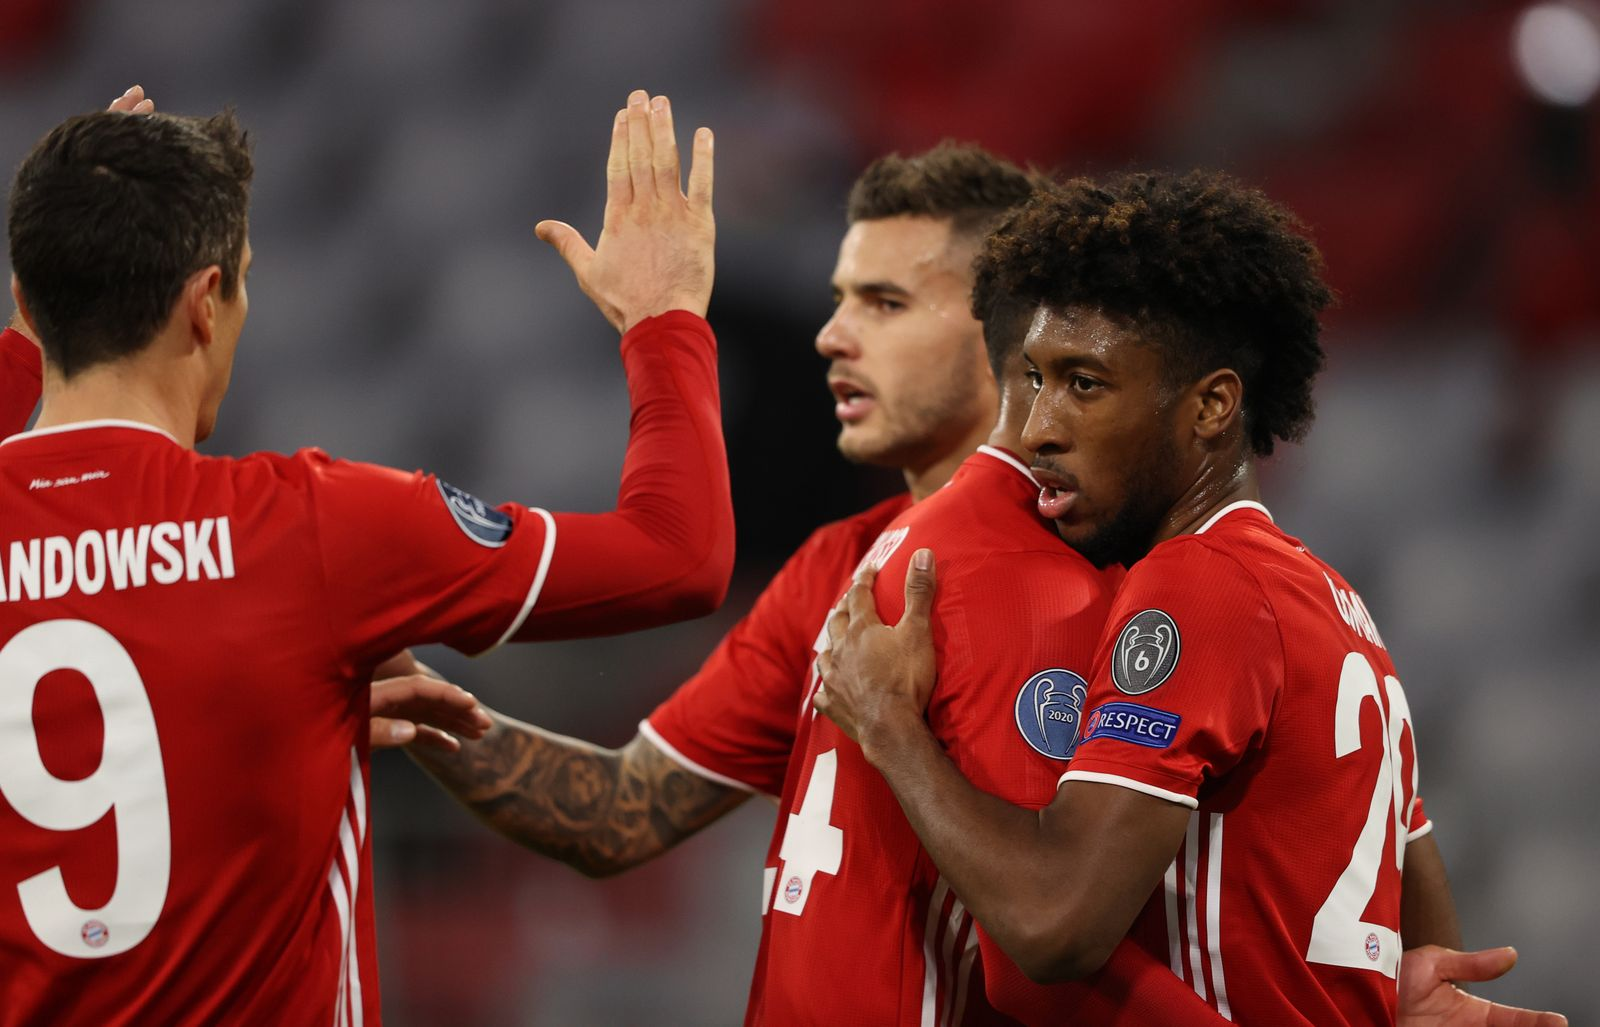 Bayern Munich vs Atletico Madrid, Germany - 21 Oct 2020